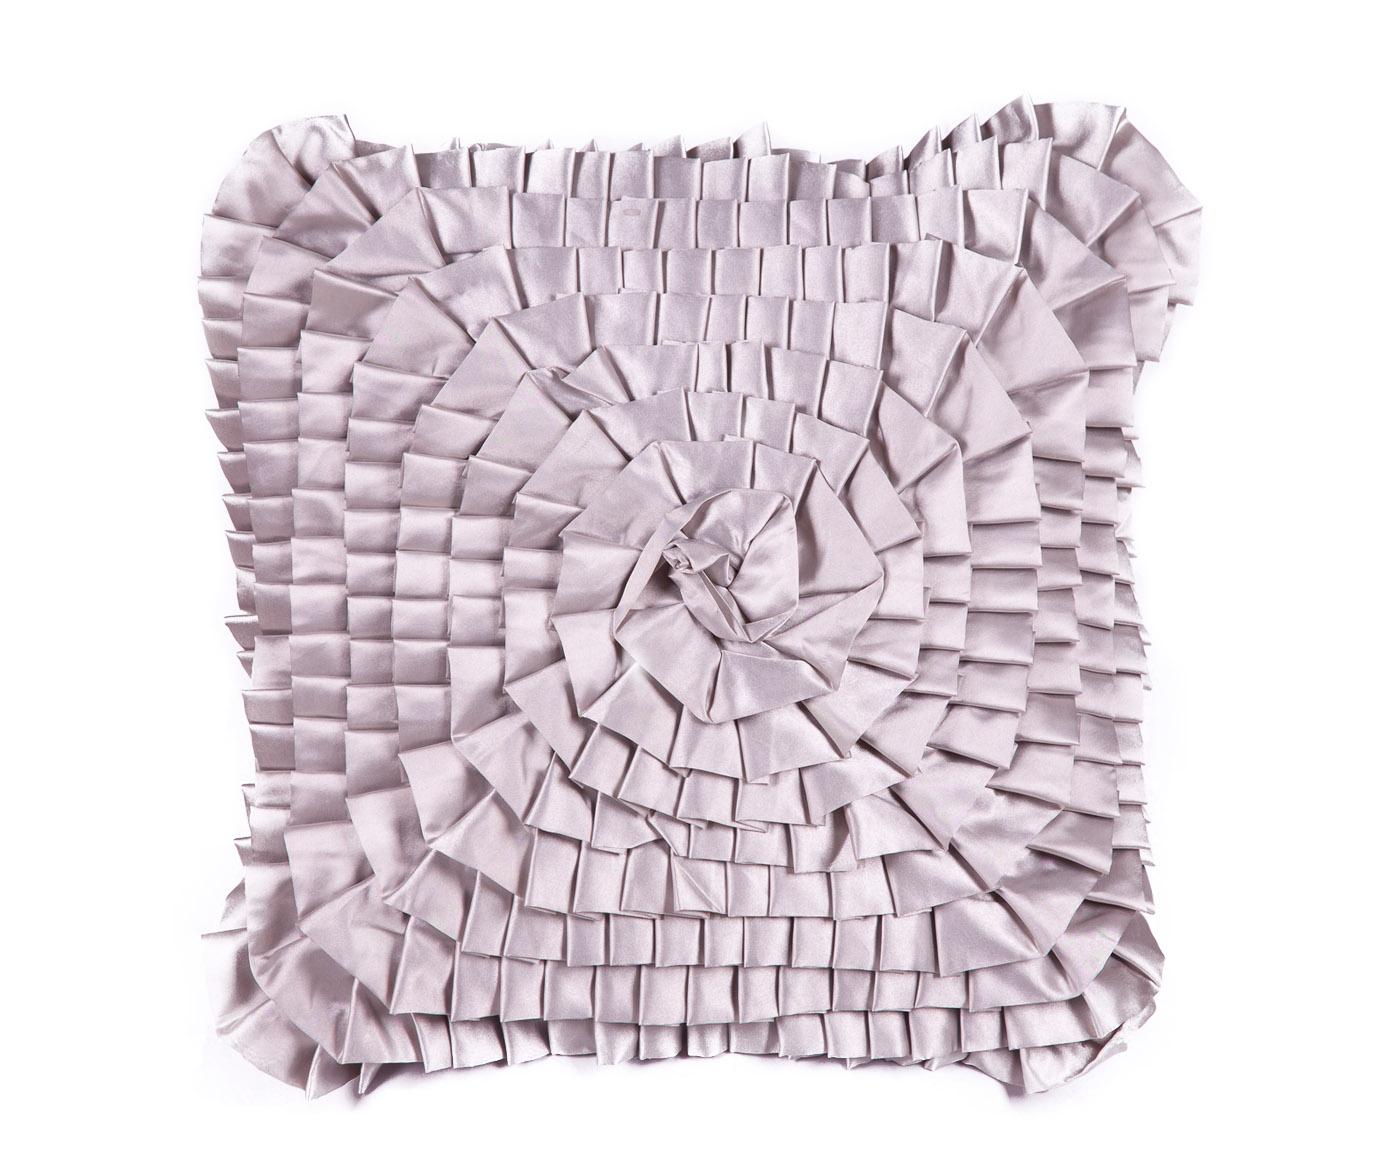 Подушка NathaliКвадратные подушки и наволочки<br><br><br>Material: Текстиль<br>Width см: 45<br>Depth см: 15<br>Height см: 45